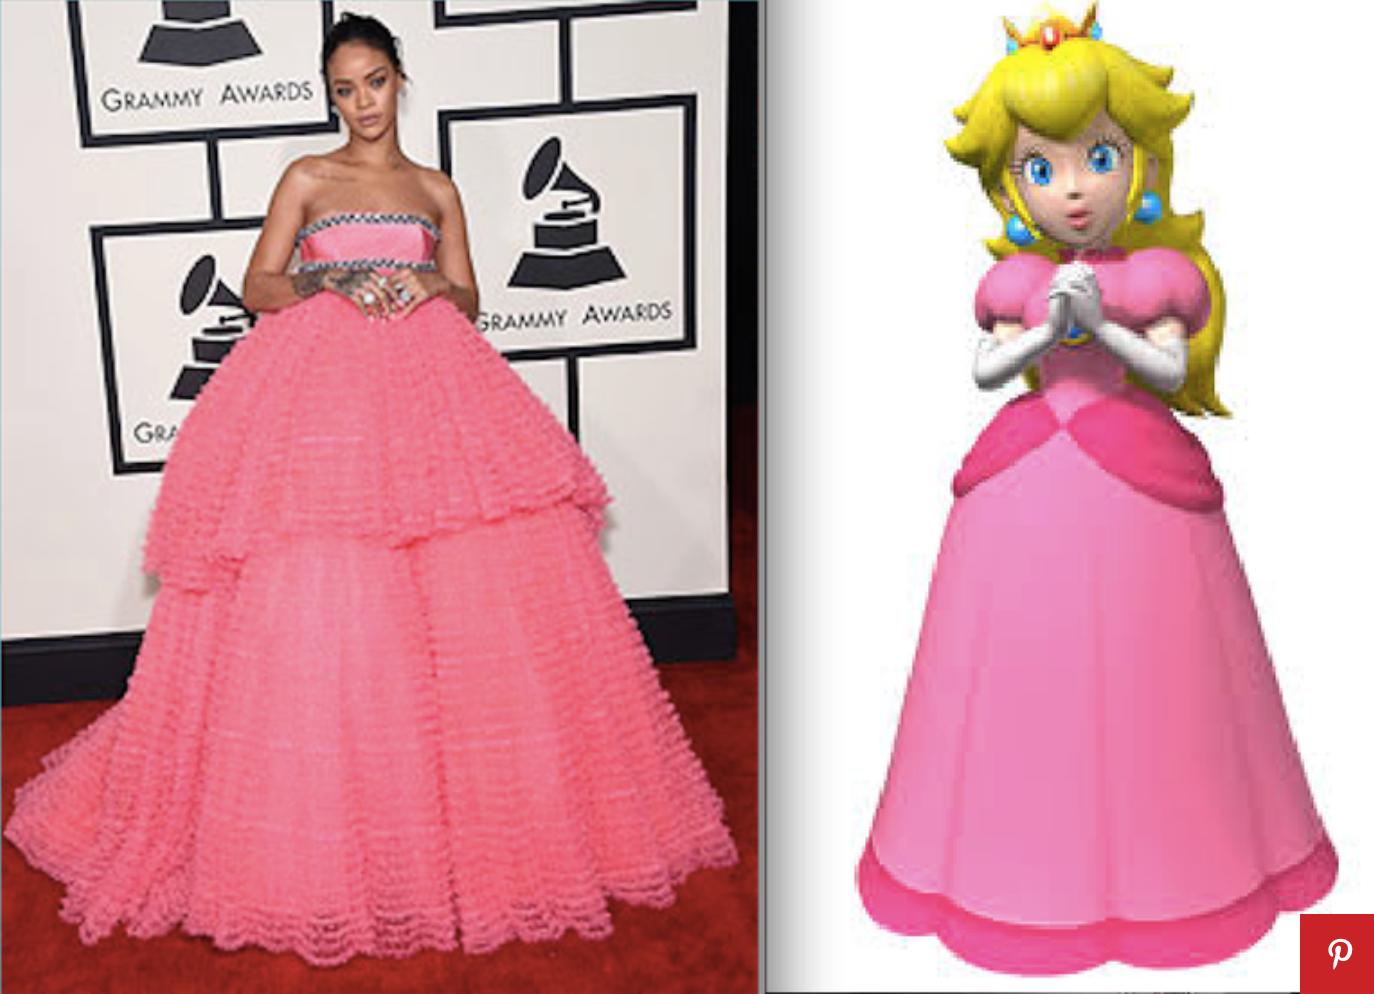 7 photos de Rihanna cosplay dans l'univers de mario